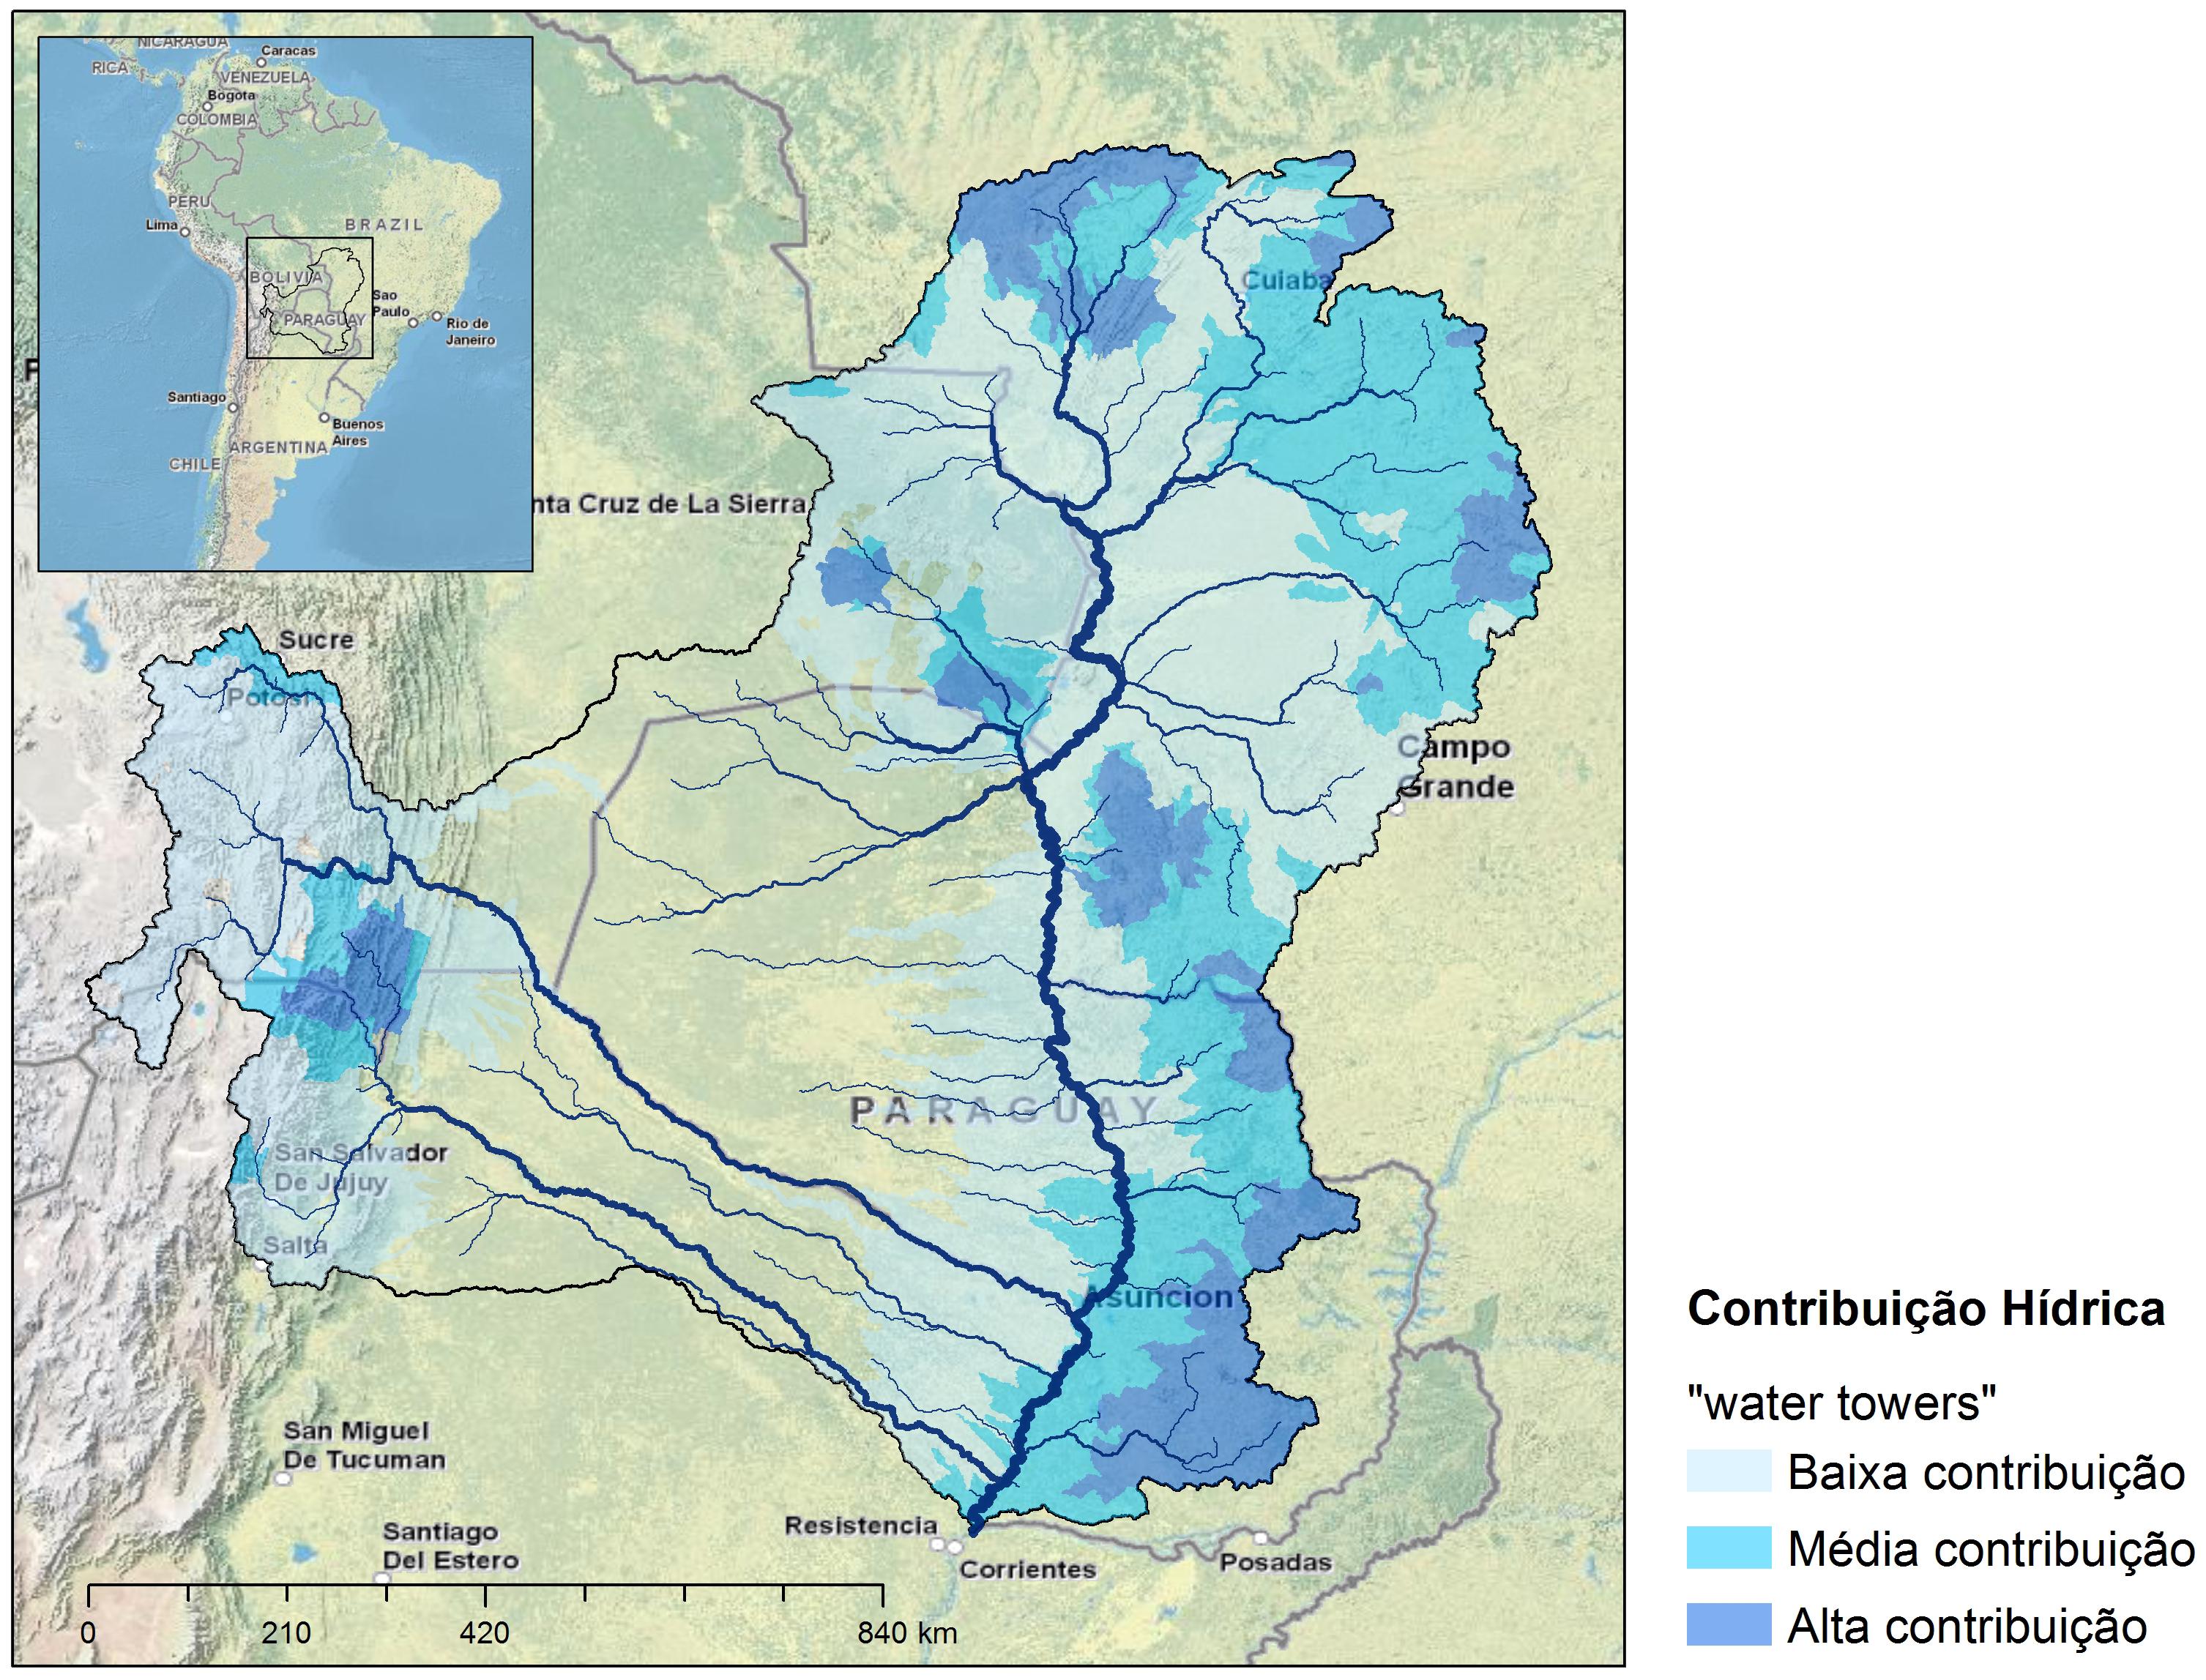 Disregard for springs and rivers threatens the Pantanal | WWF Brasil